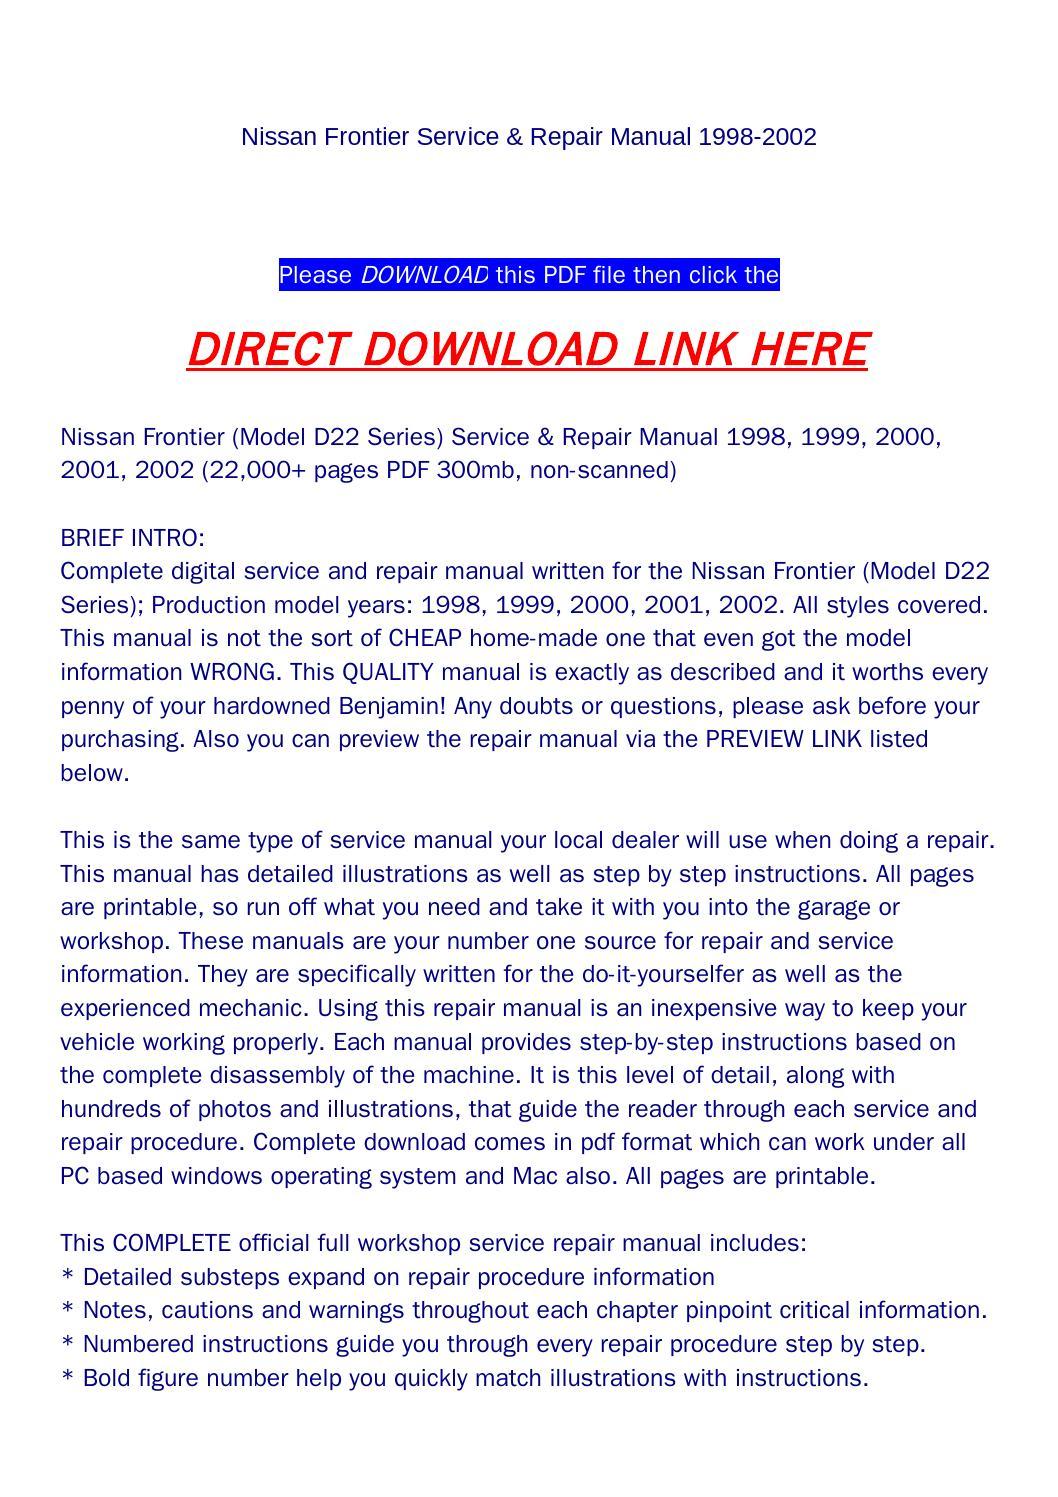 Nissan Frontier PDF Owner s Manuals